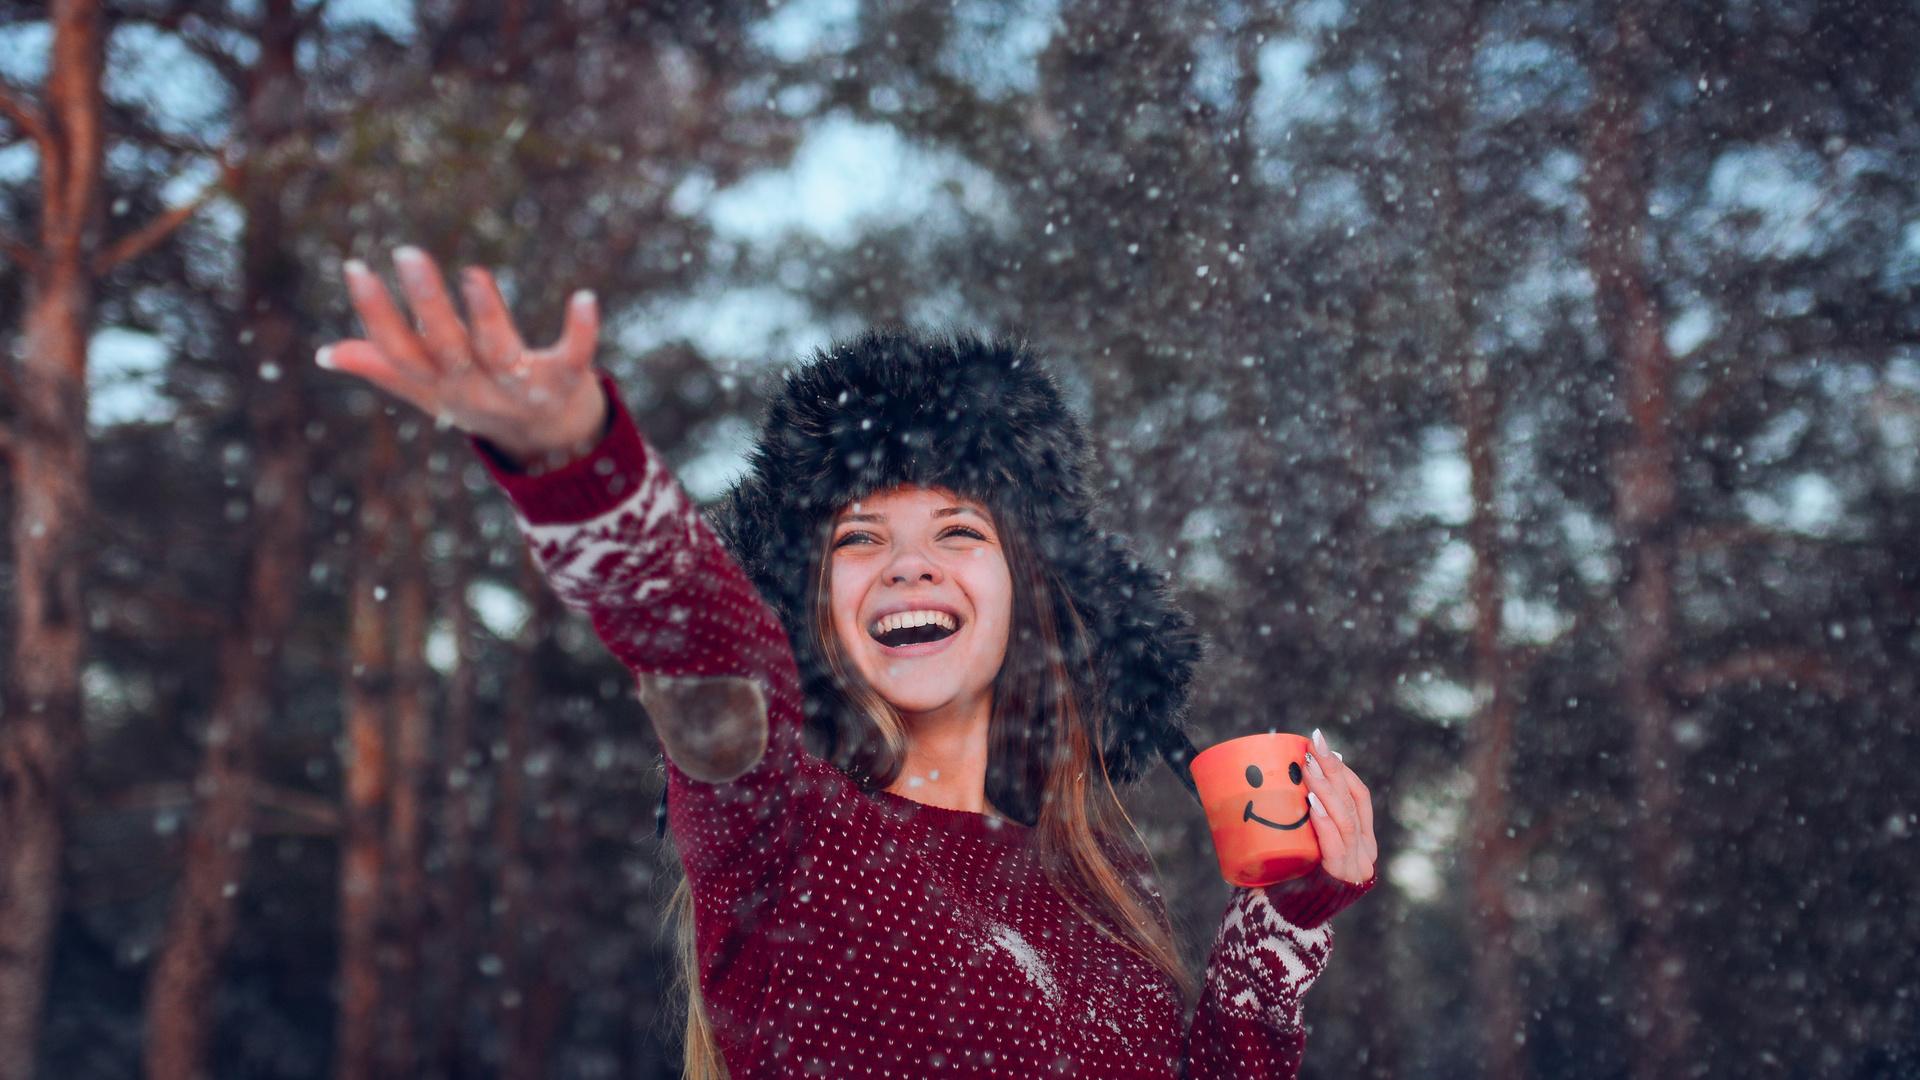 Картинка зимнее счастье